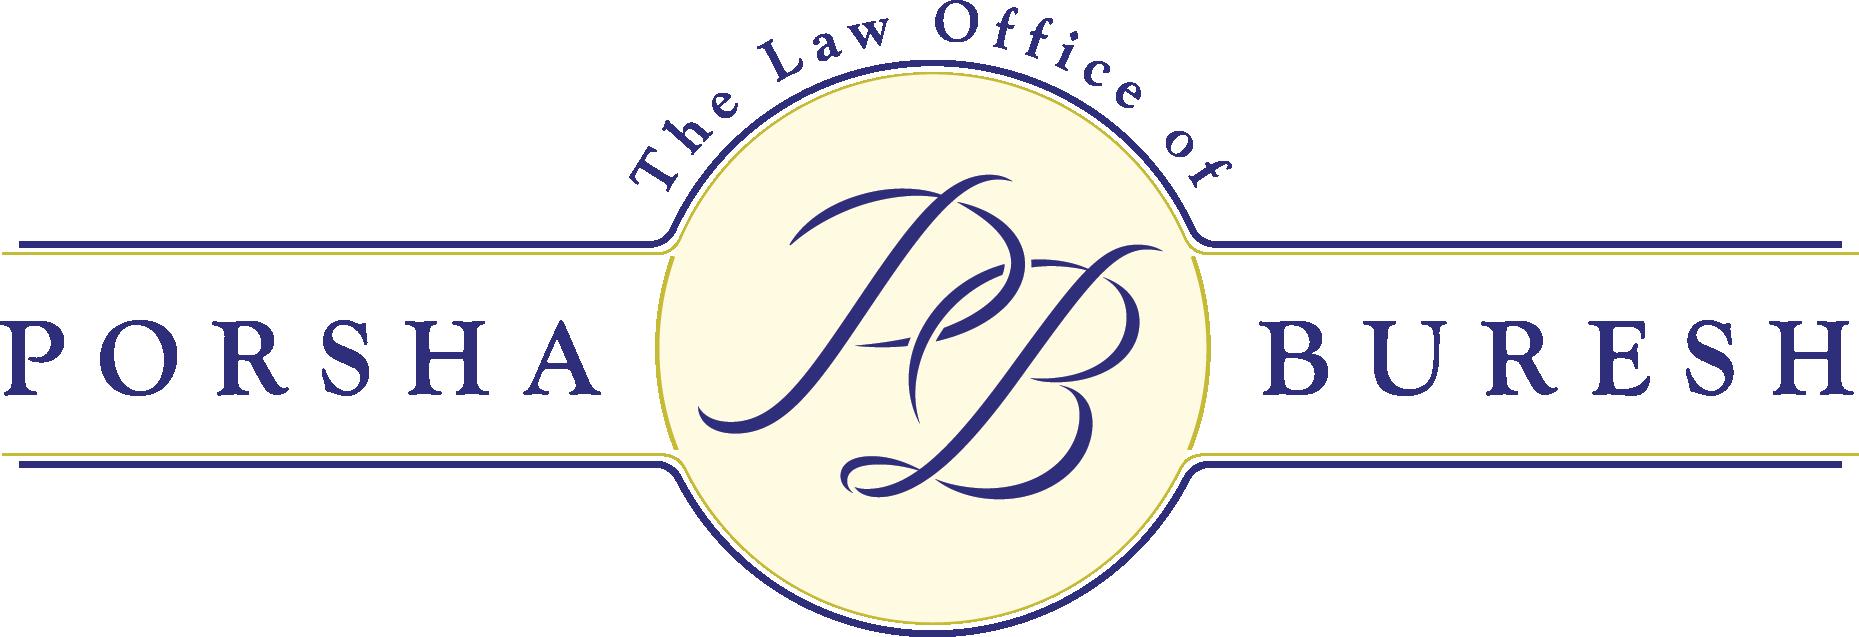 Logo of The Law Office of Porsha N. Buresh